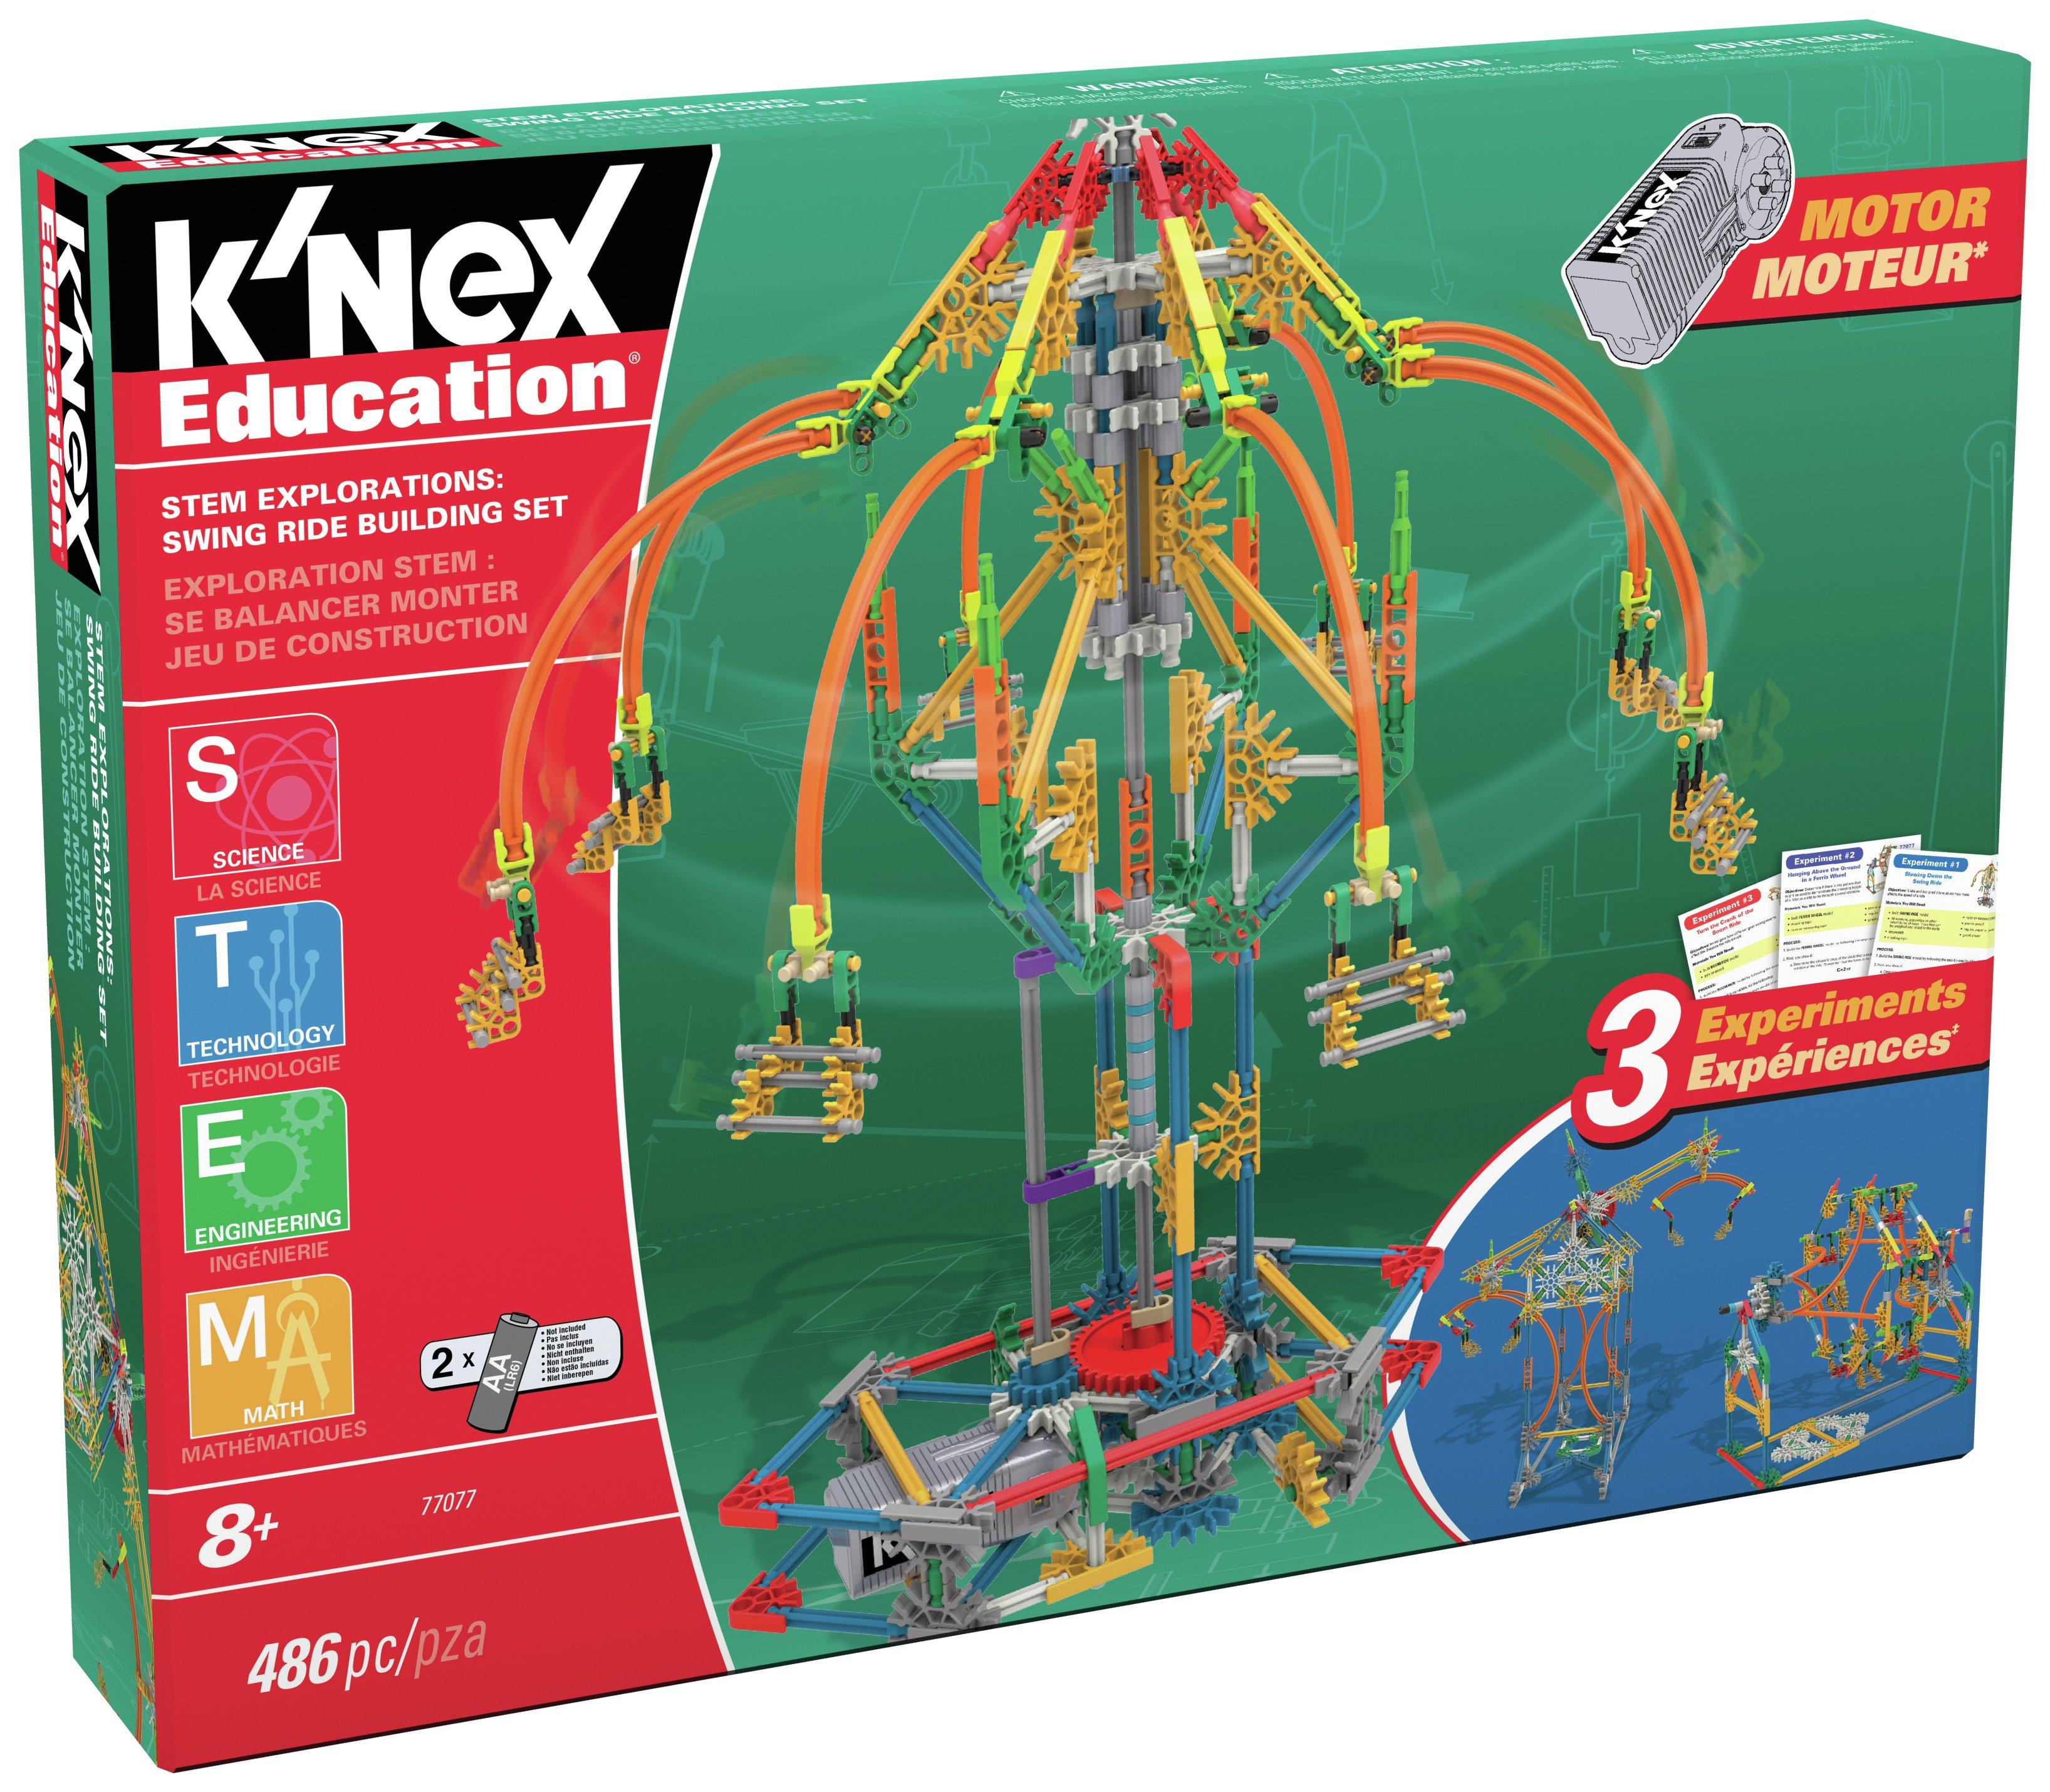 K'NEX STEM Explorations Swing Ride Building Set.